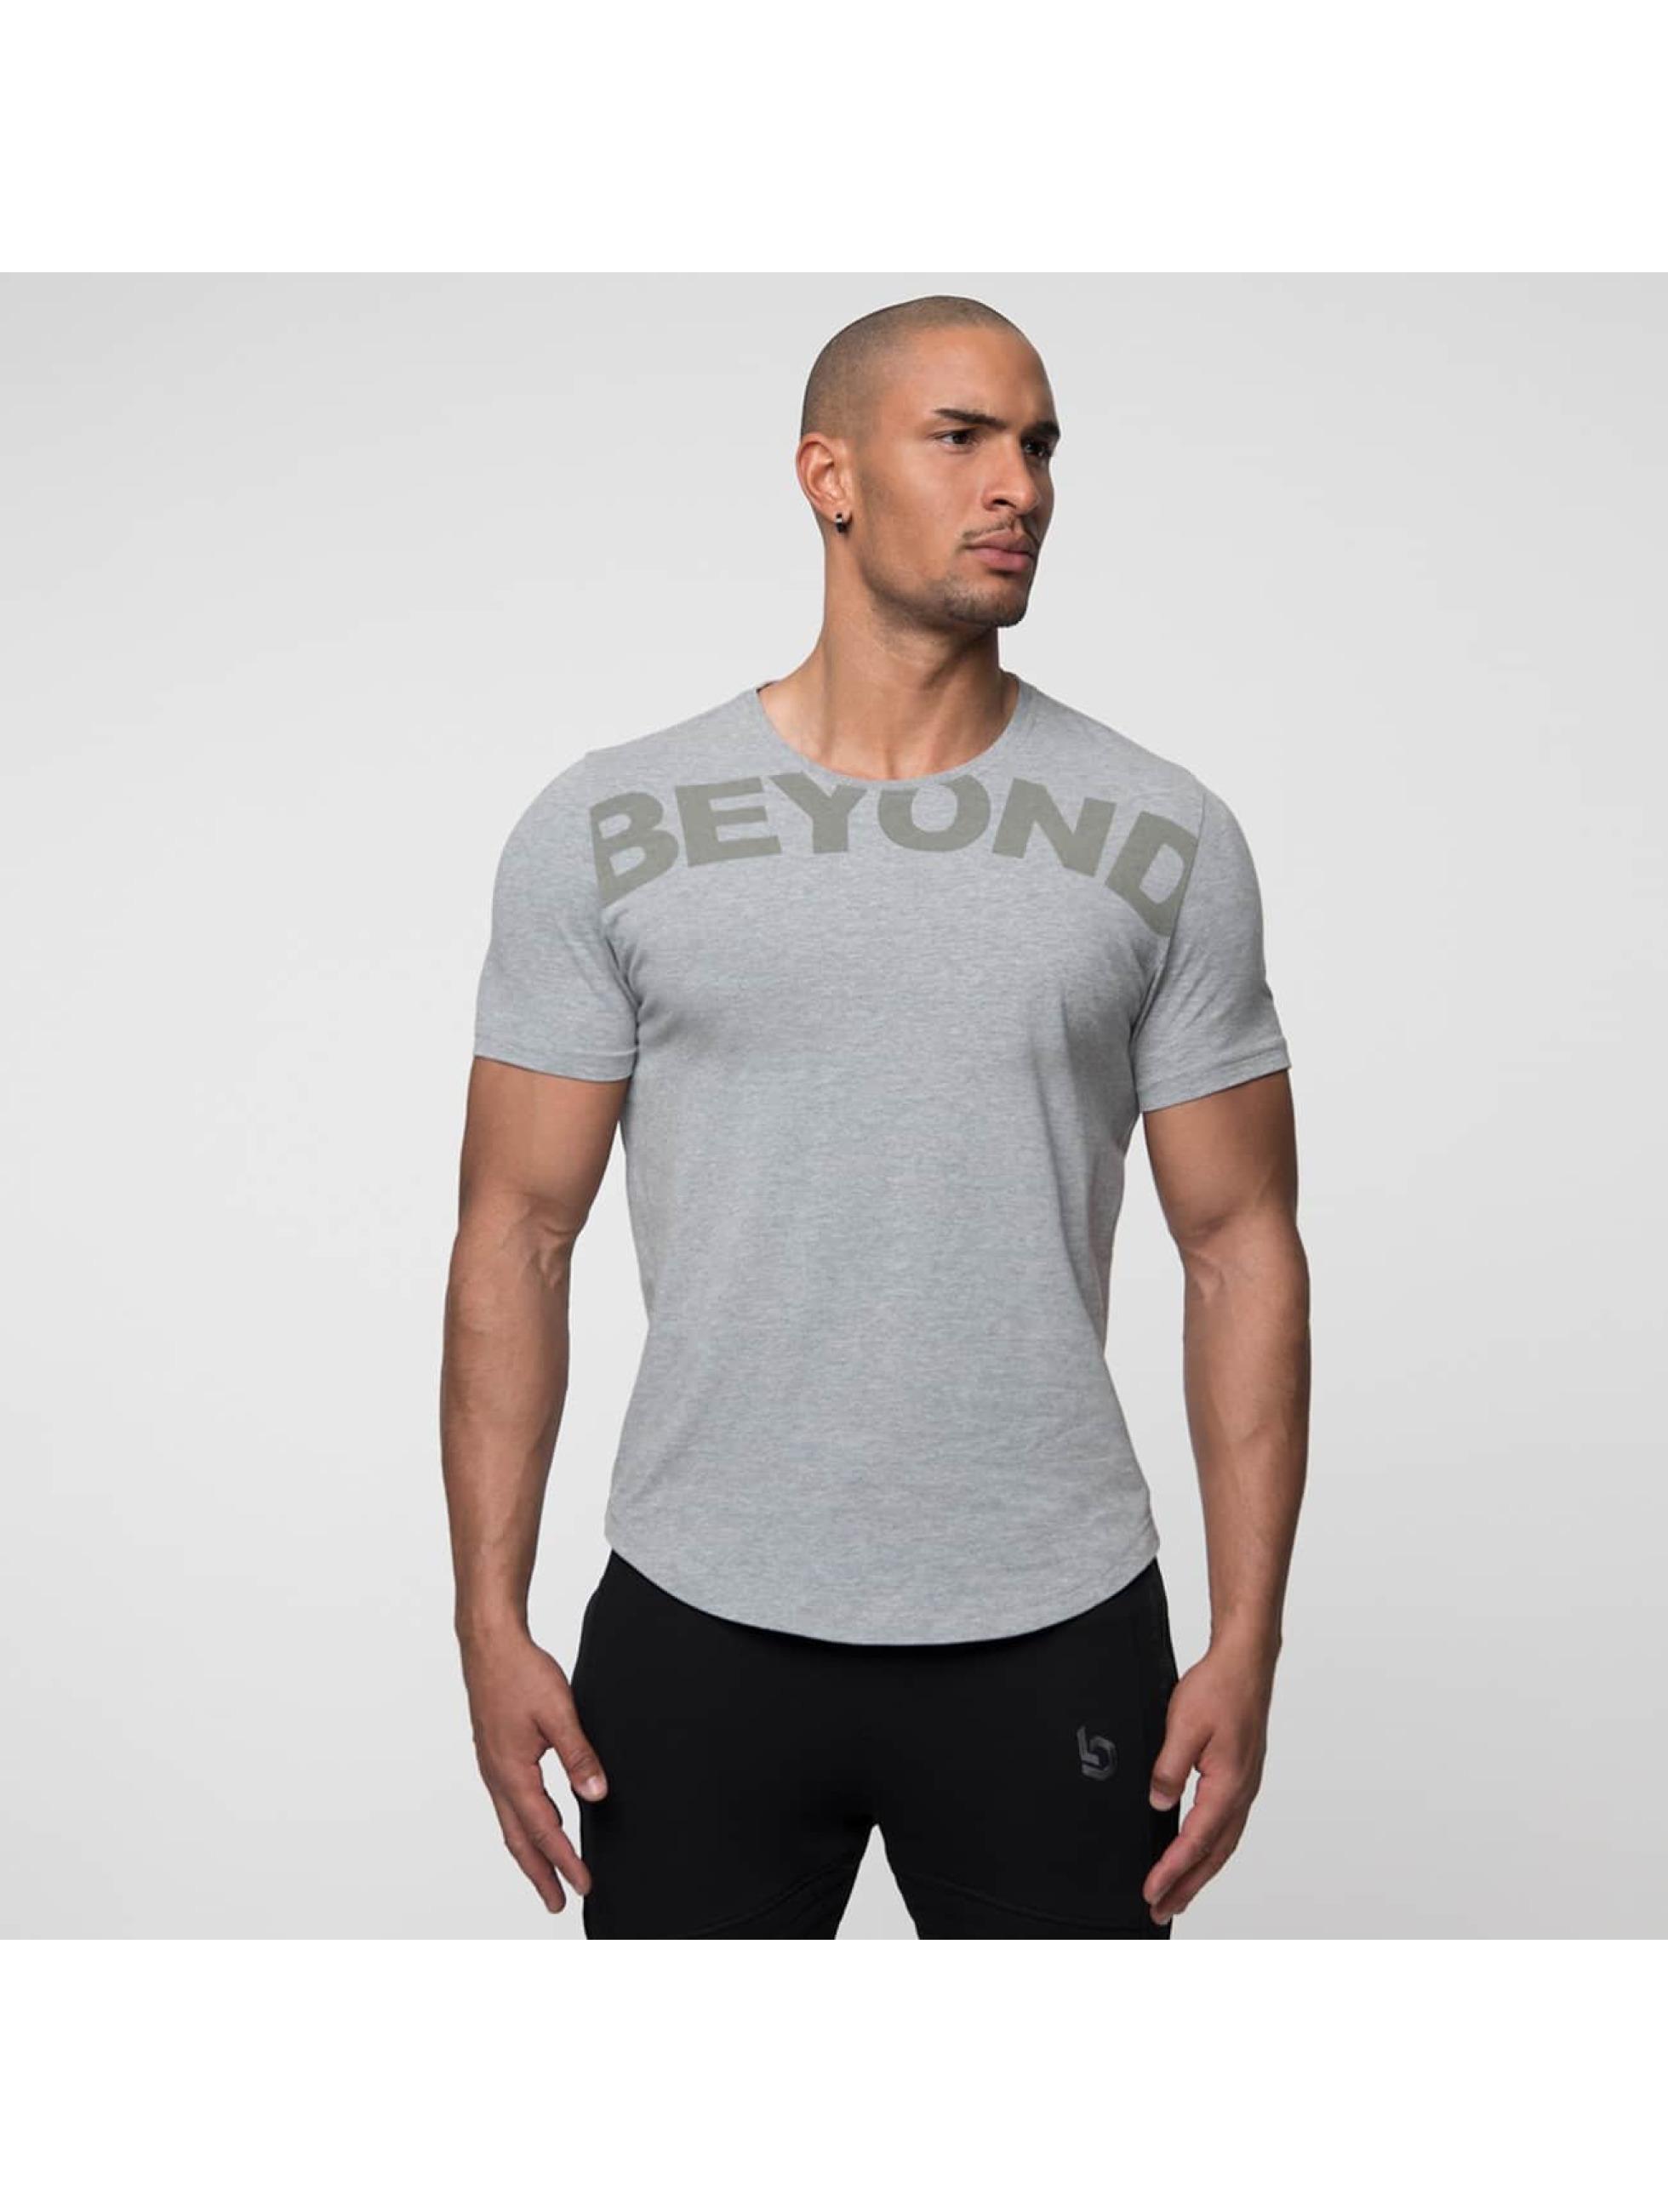 Beyond Limits T-Shirt League grey